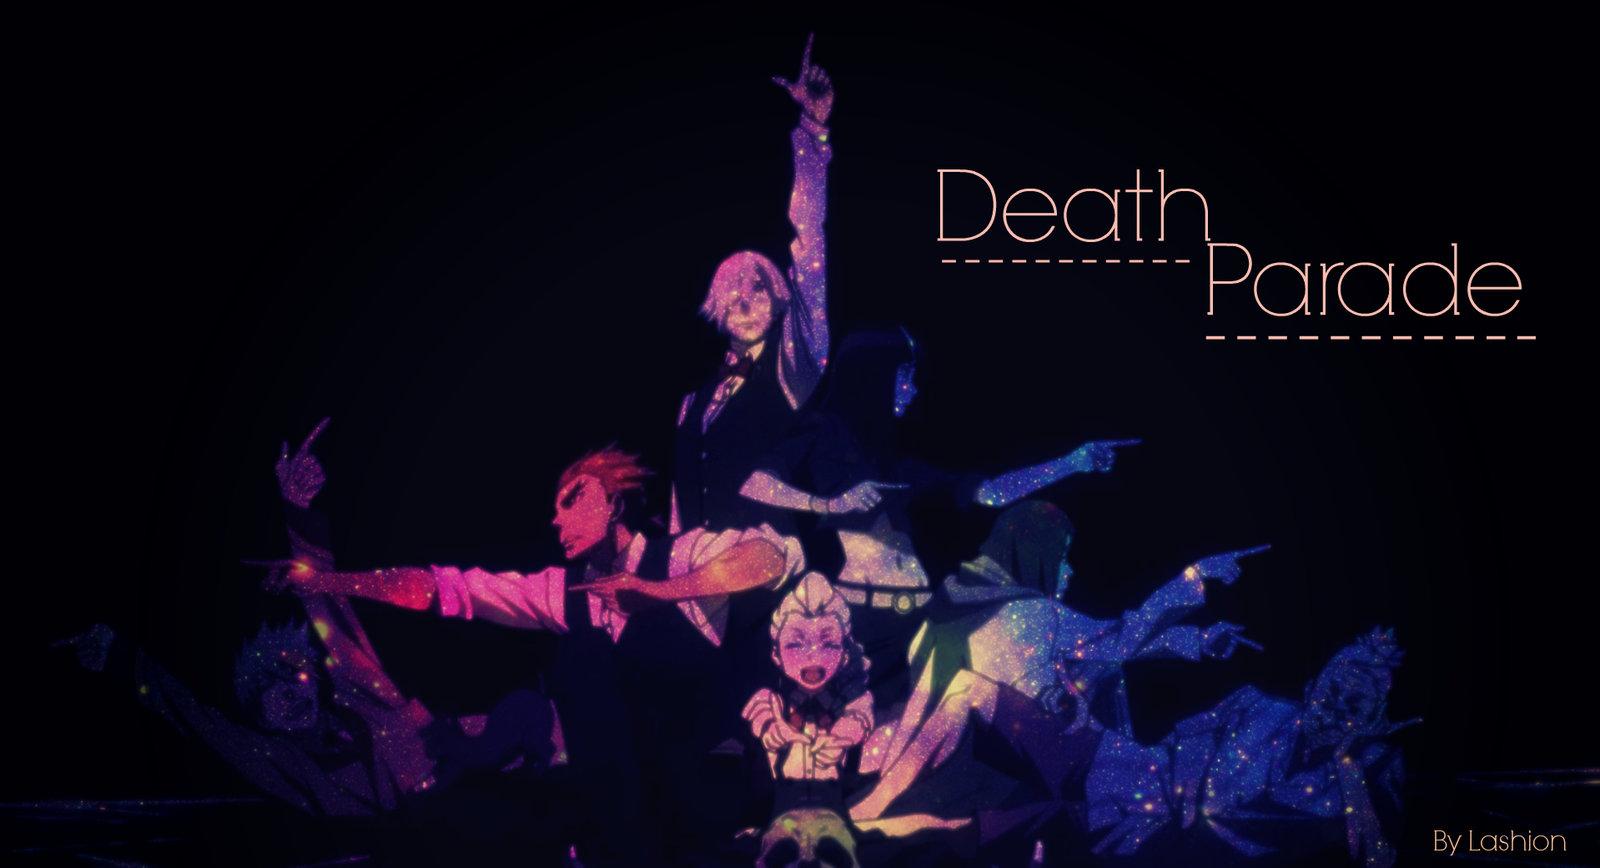 Death Parade Wallpaper 13   1600 X 868 stmednet 1600x868